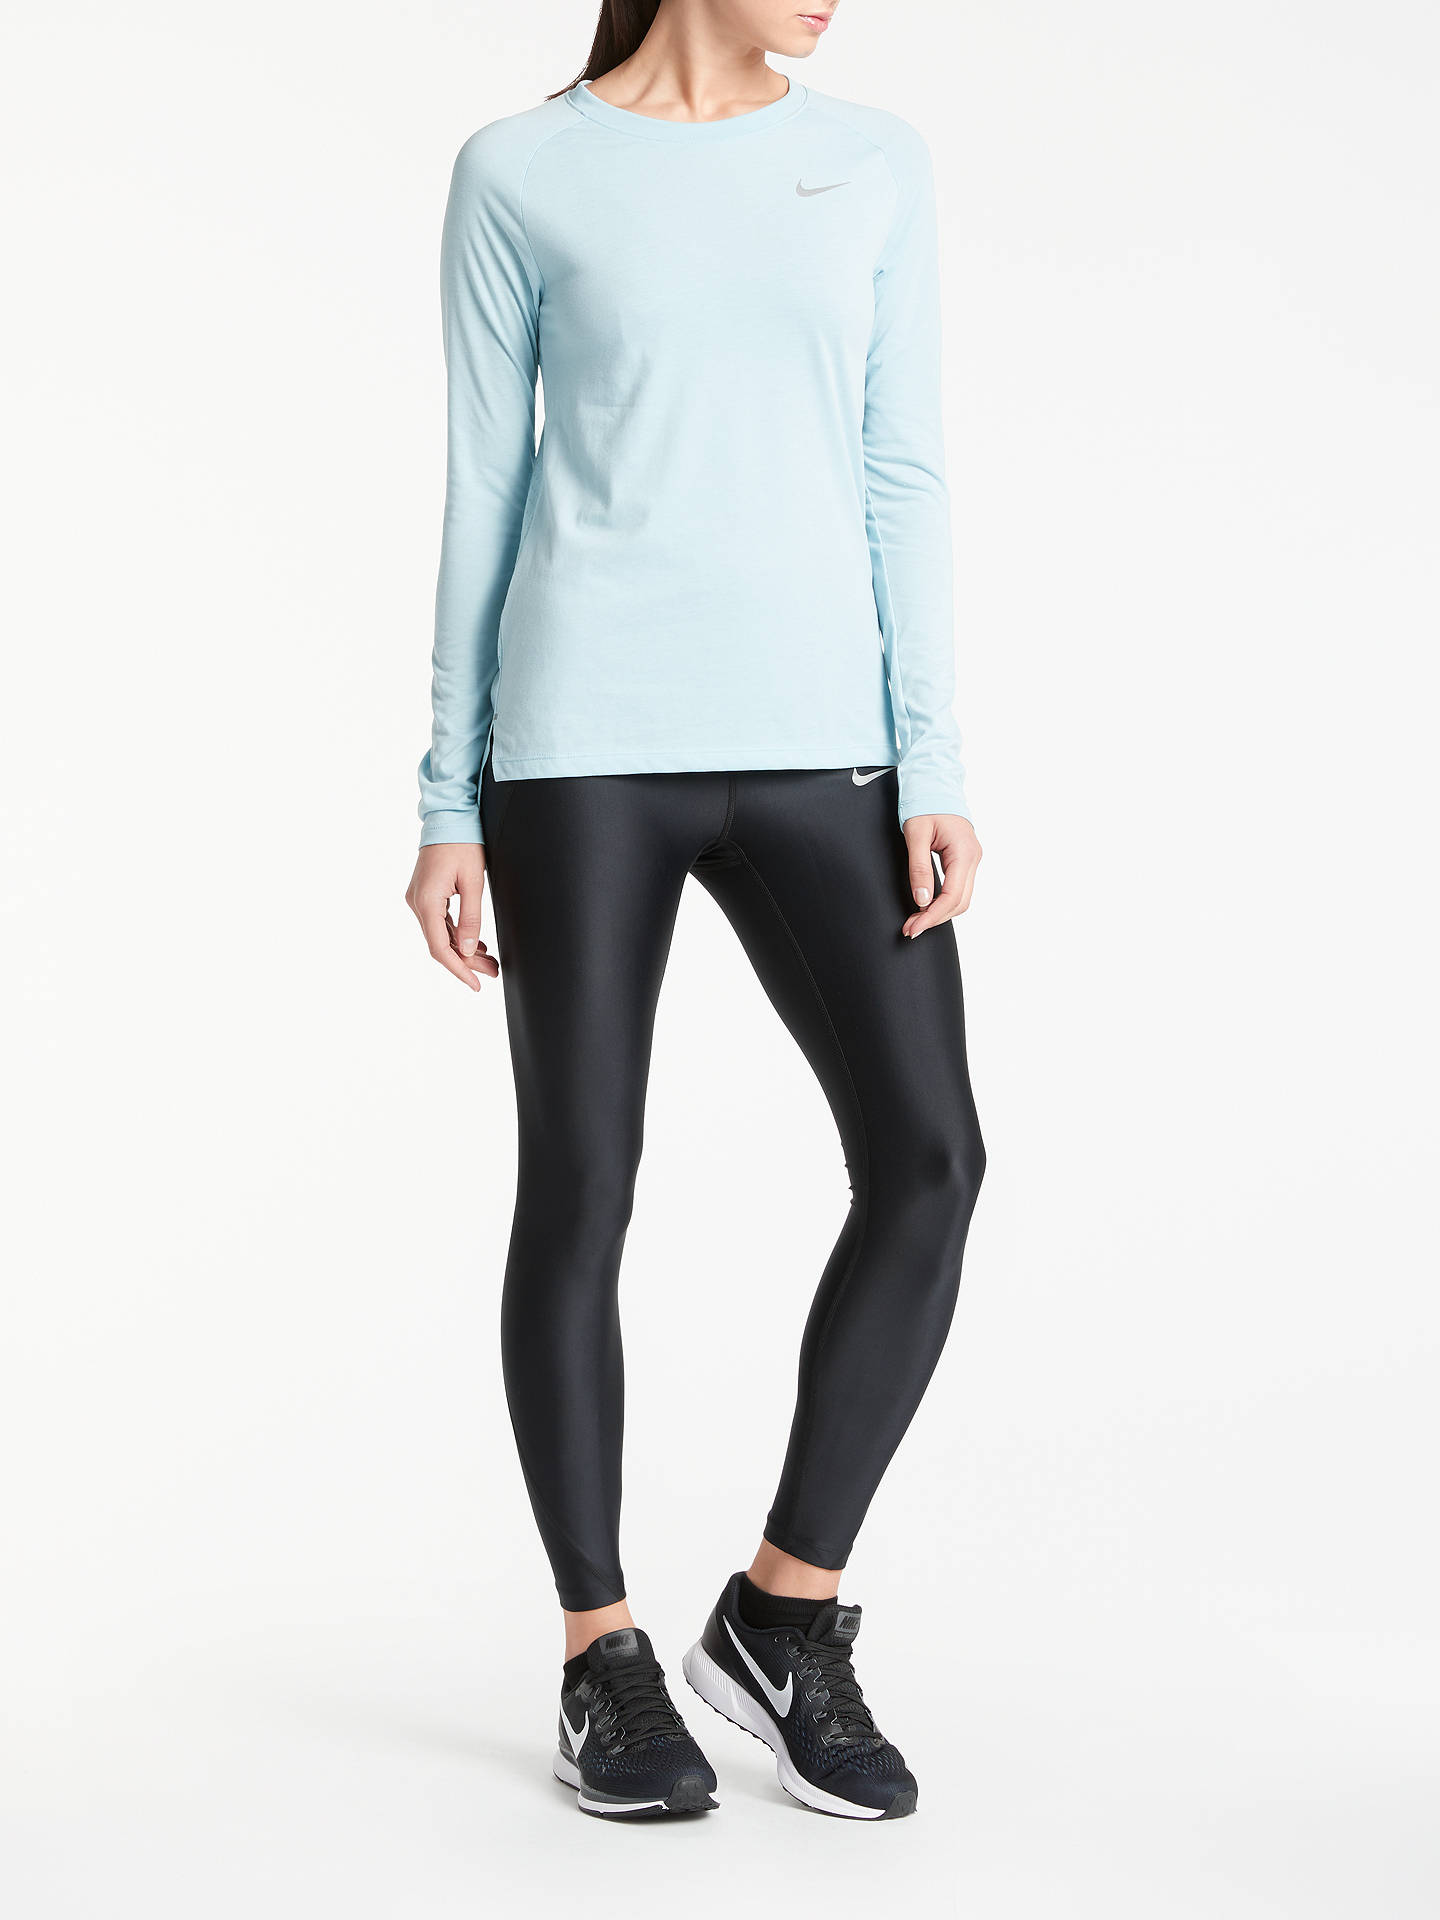 136b9d4337eab Buy Nike Speed 7/8 Running Tights, Black, XS Online at johnlewis.